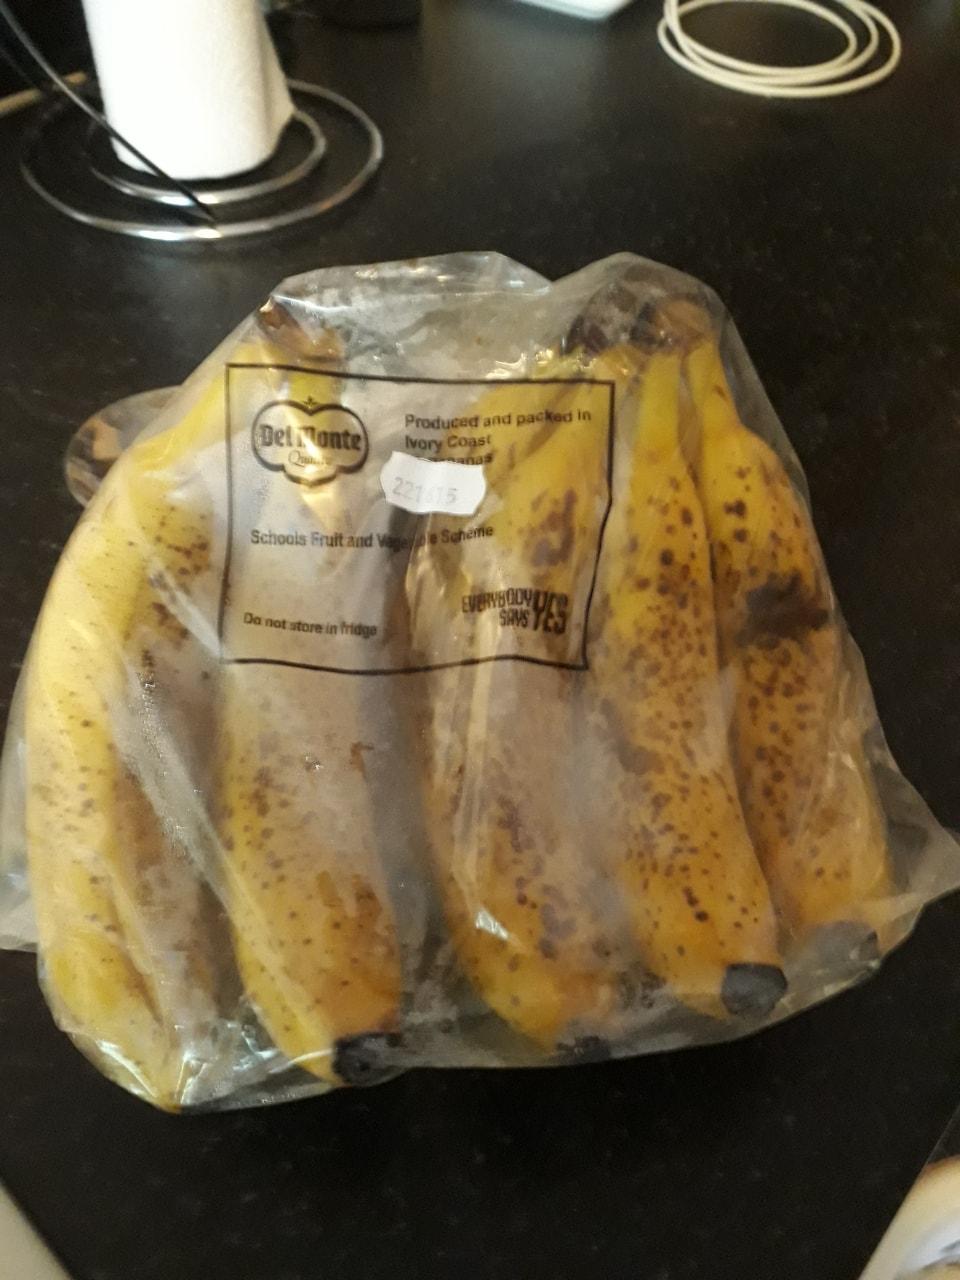 10 ripe bananas